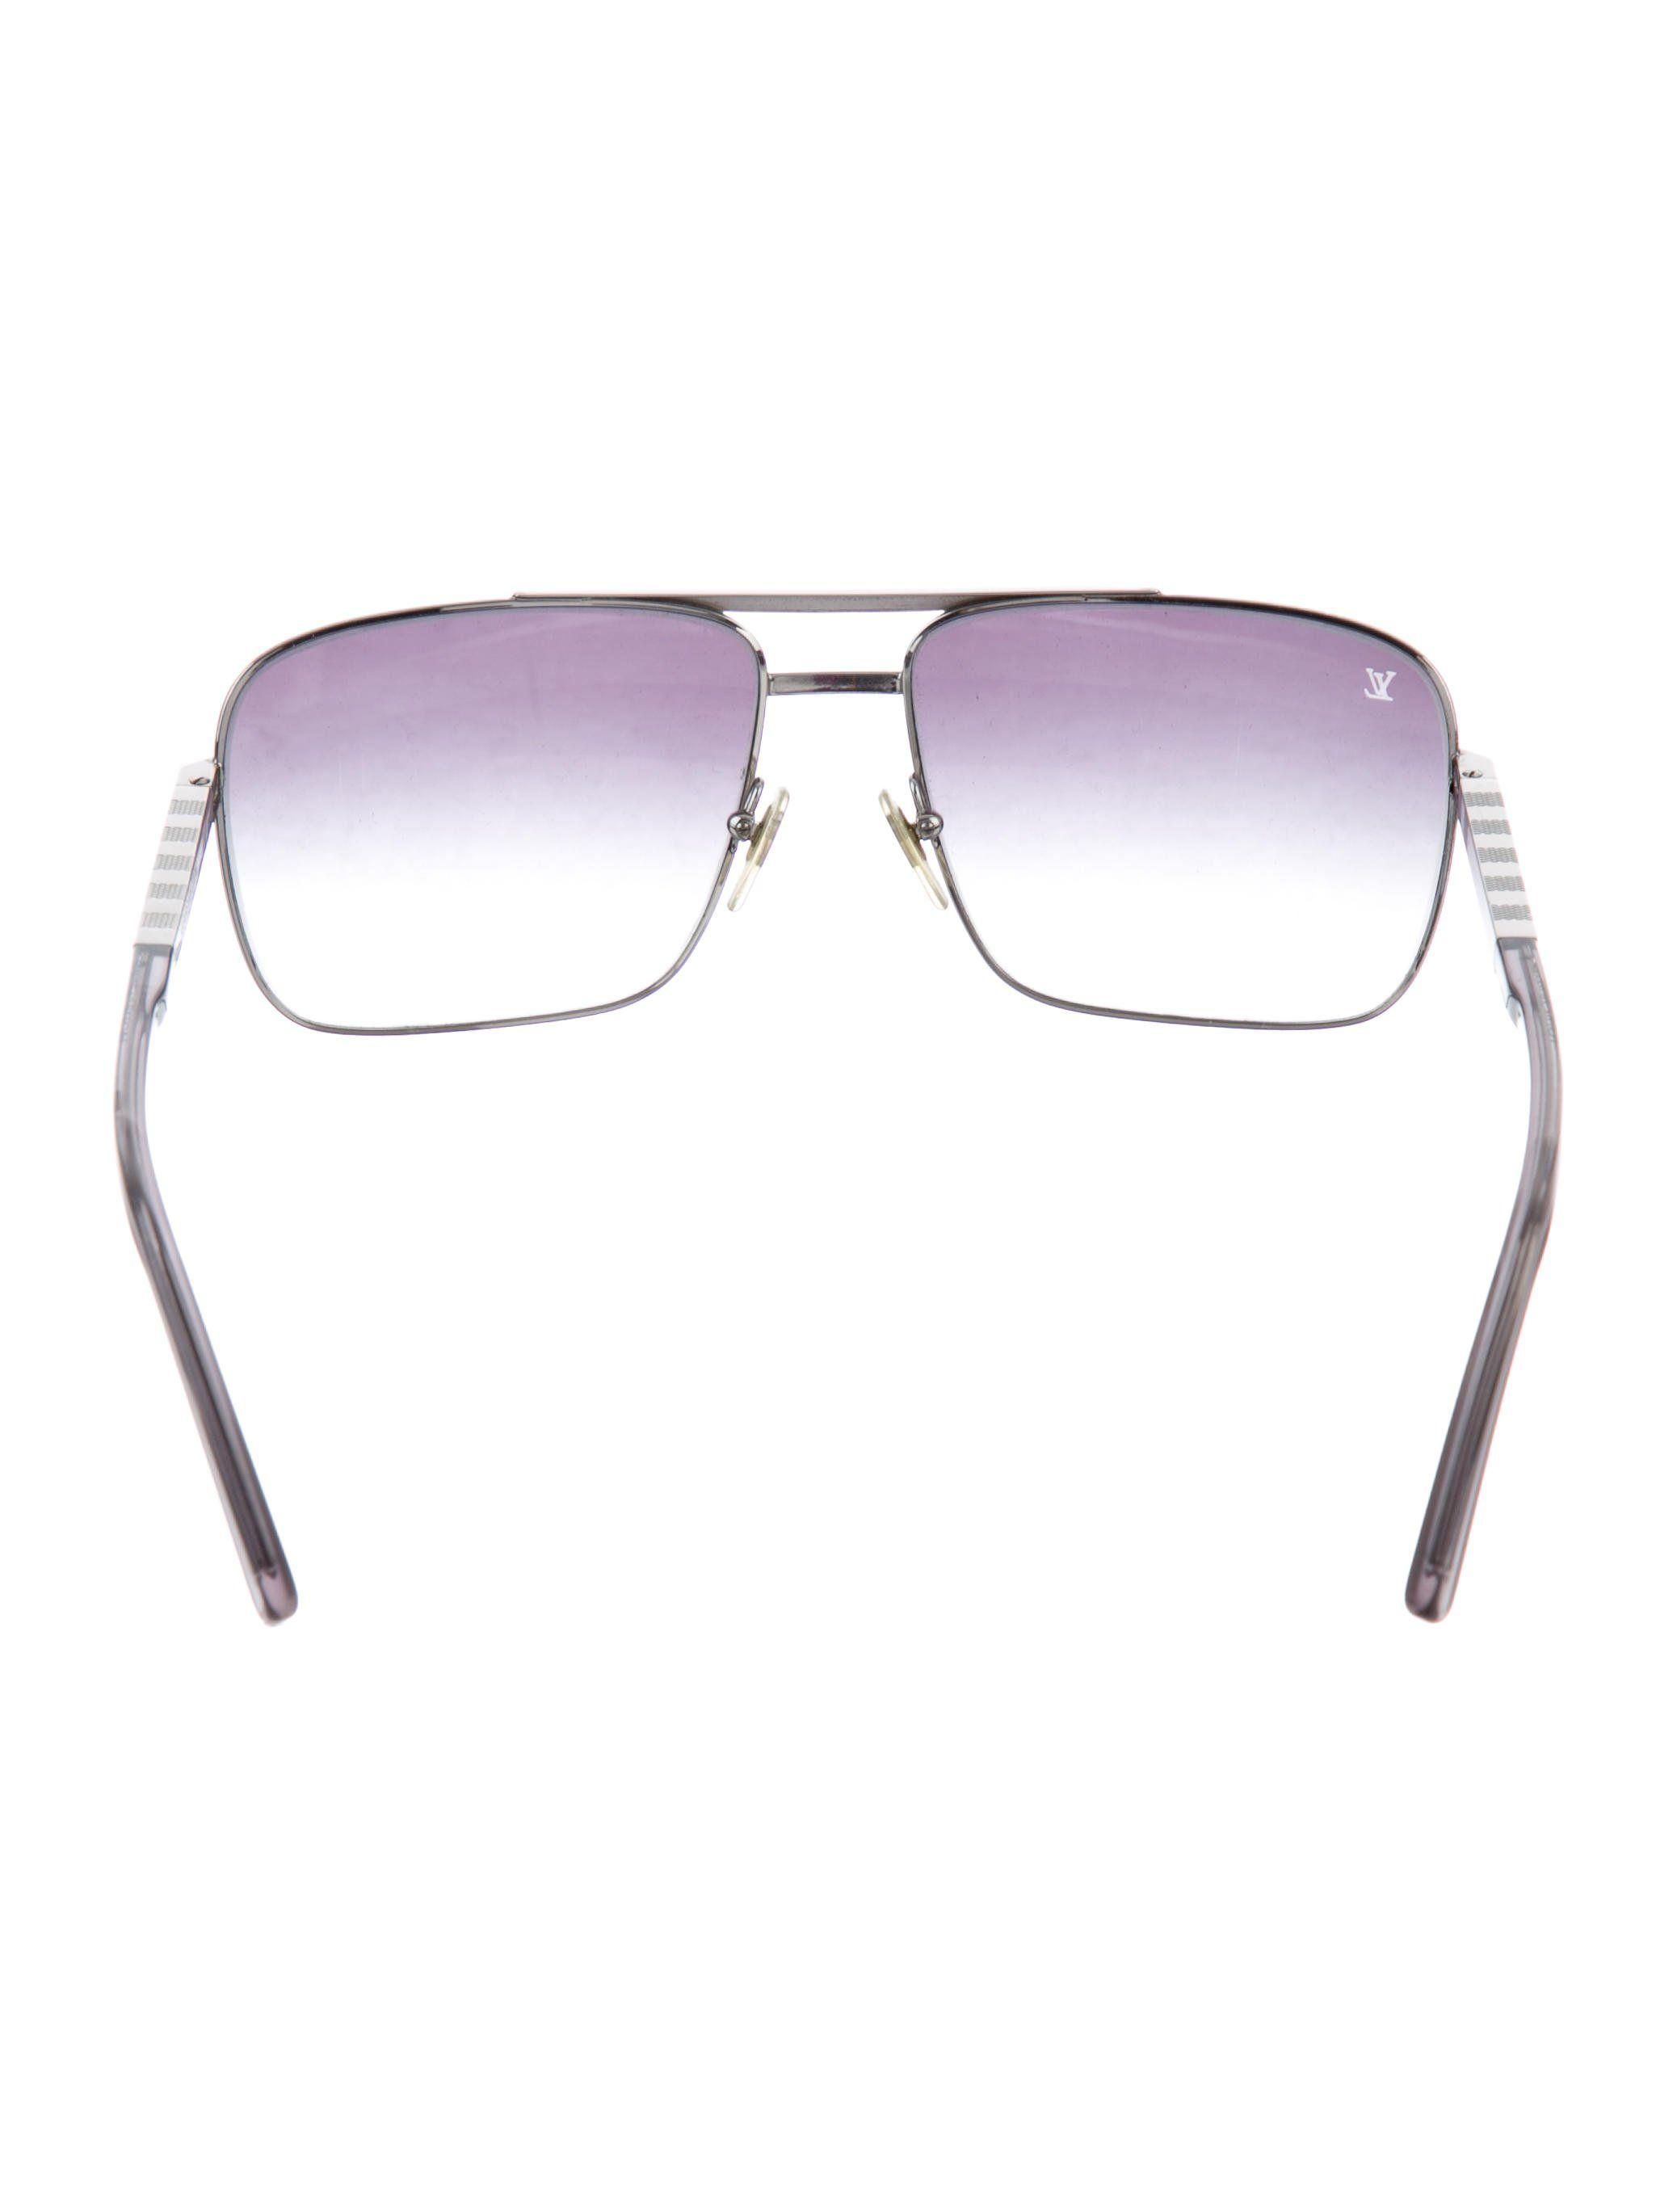 91b105686855 Men s silver-tone Louis Vuitton Attitude Pilote sunglasses with rubber nose  pads and gradient lenses. Includes case.